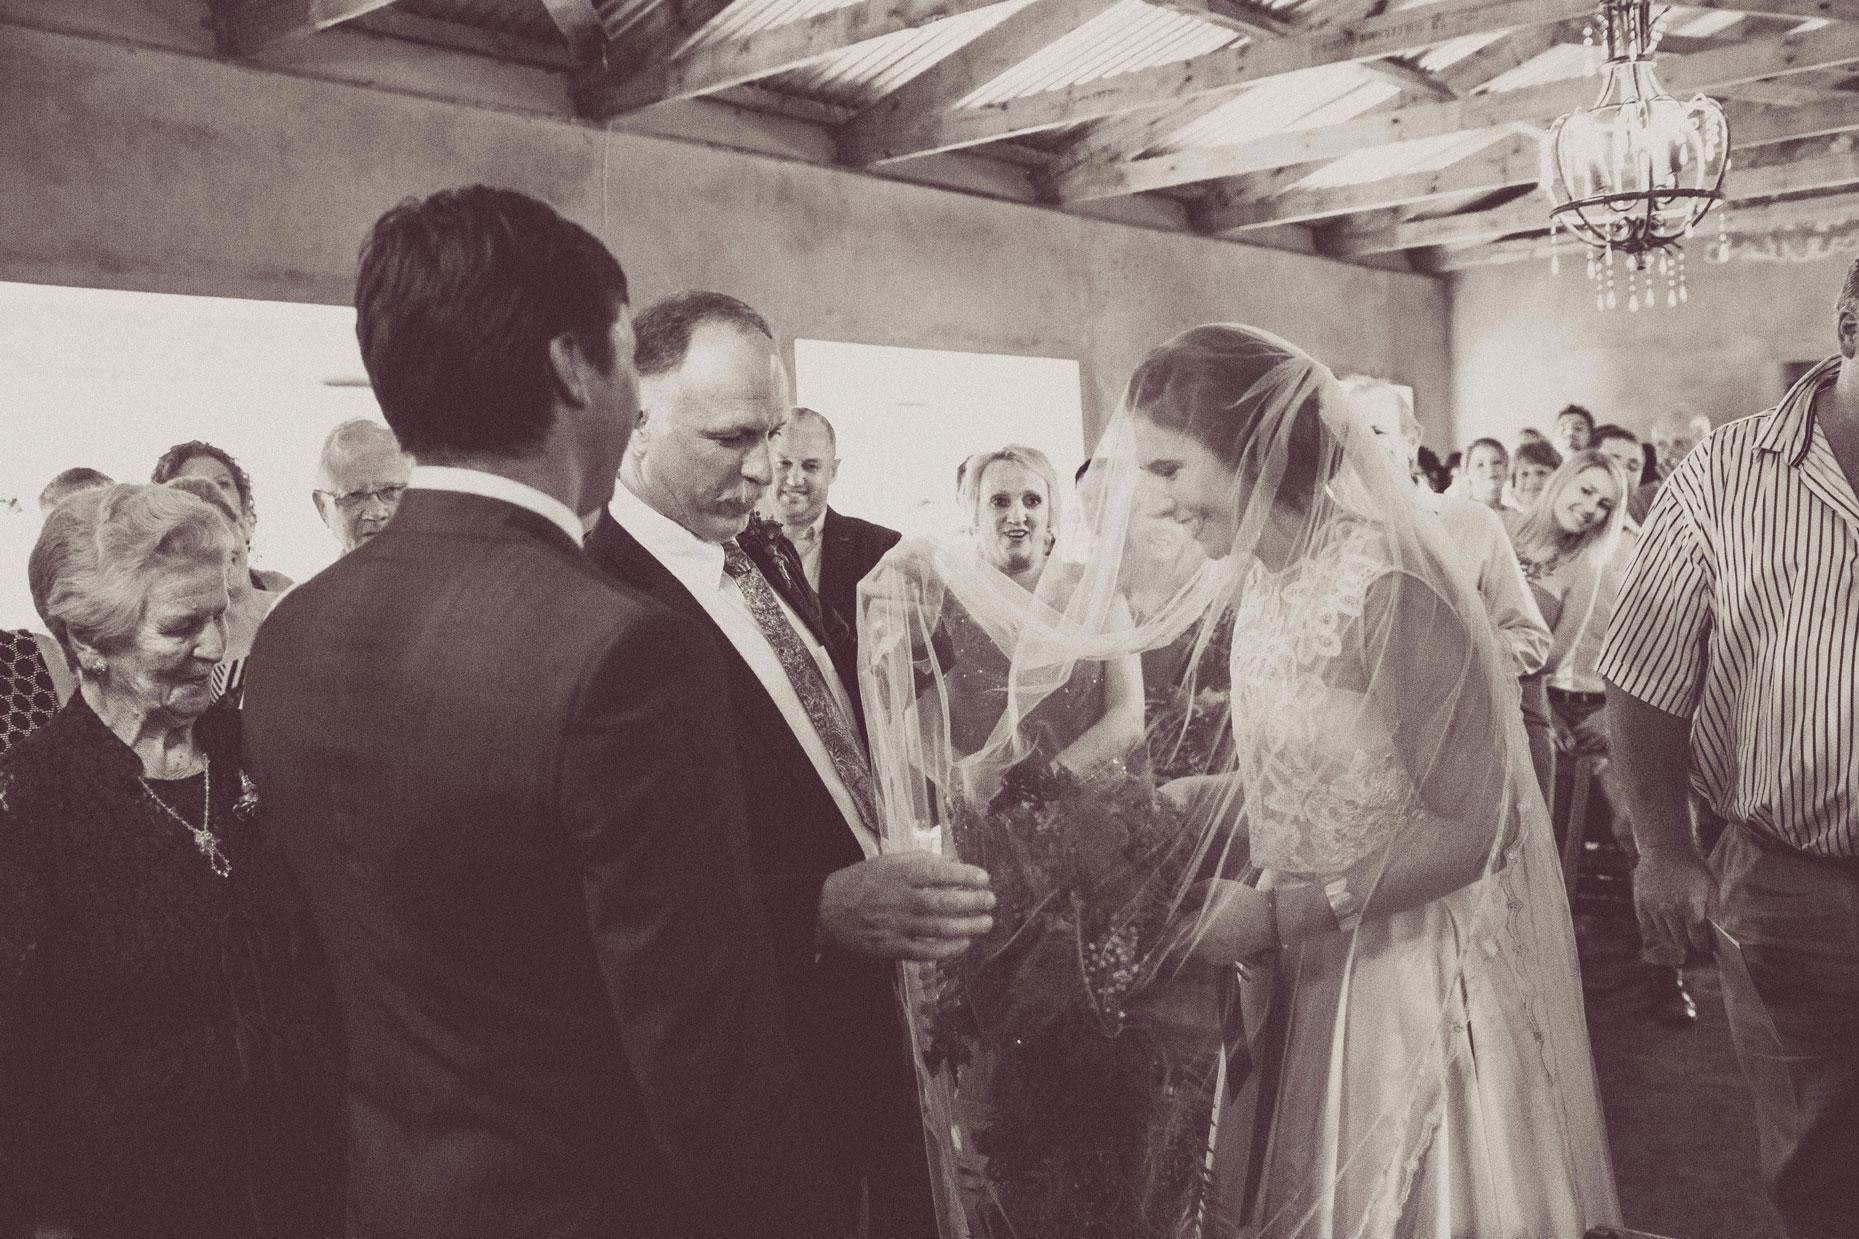 The Nutcracker_Wedding Photography_Maryke Albertyn 27